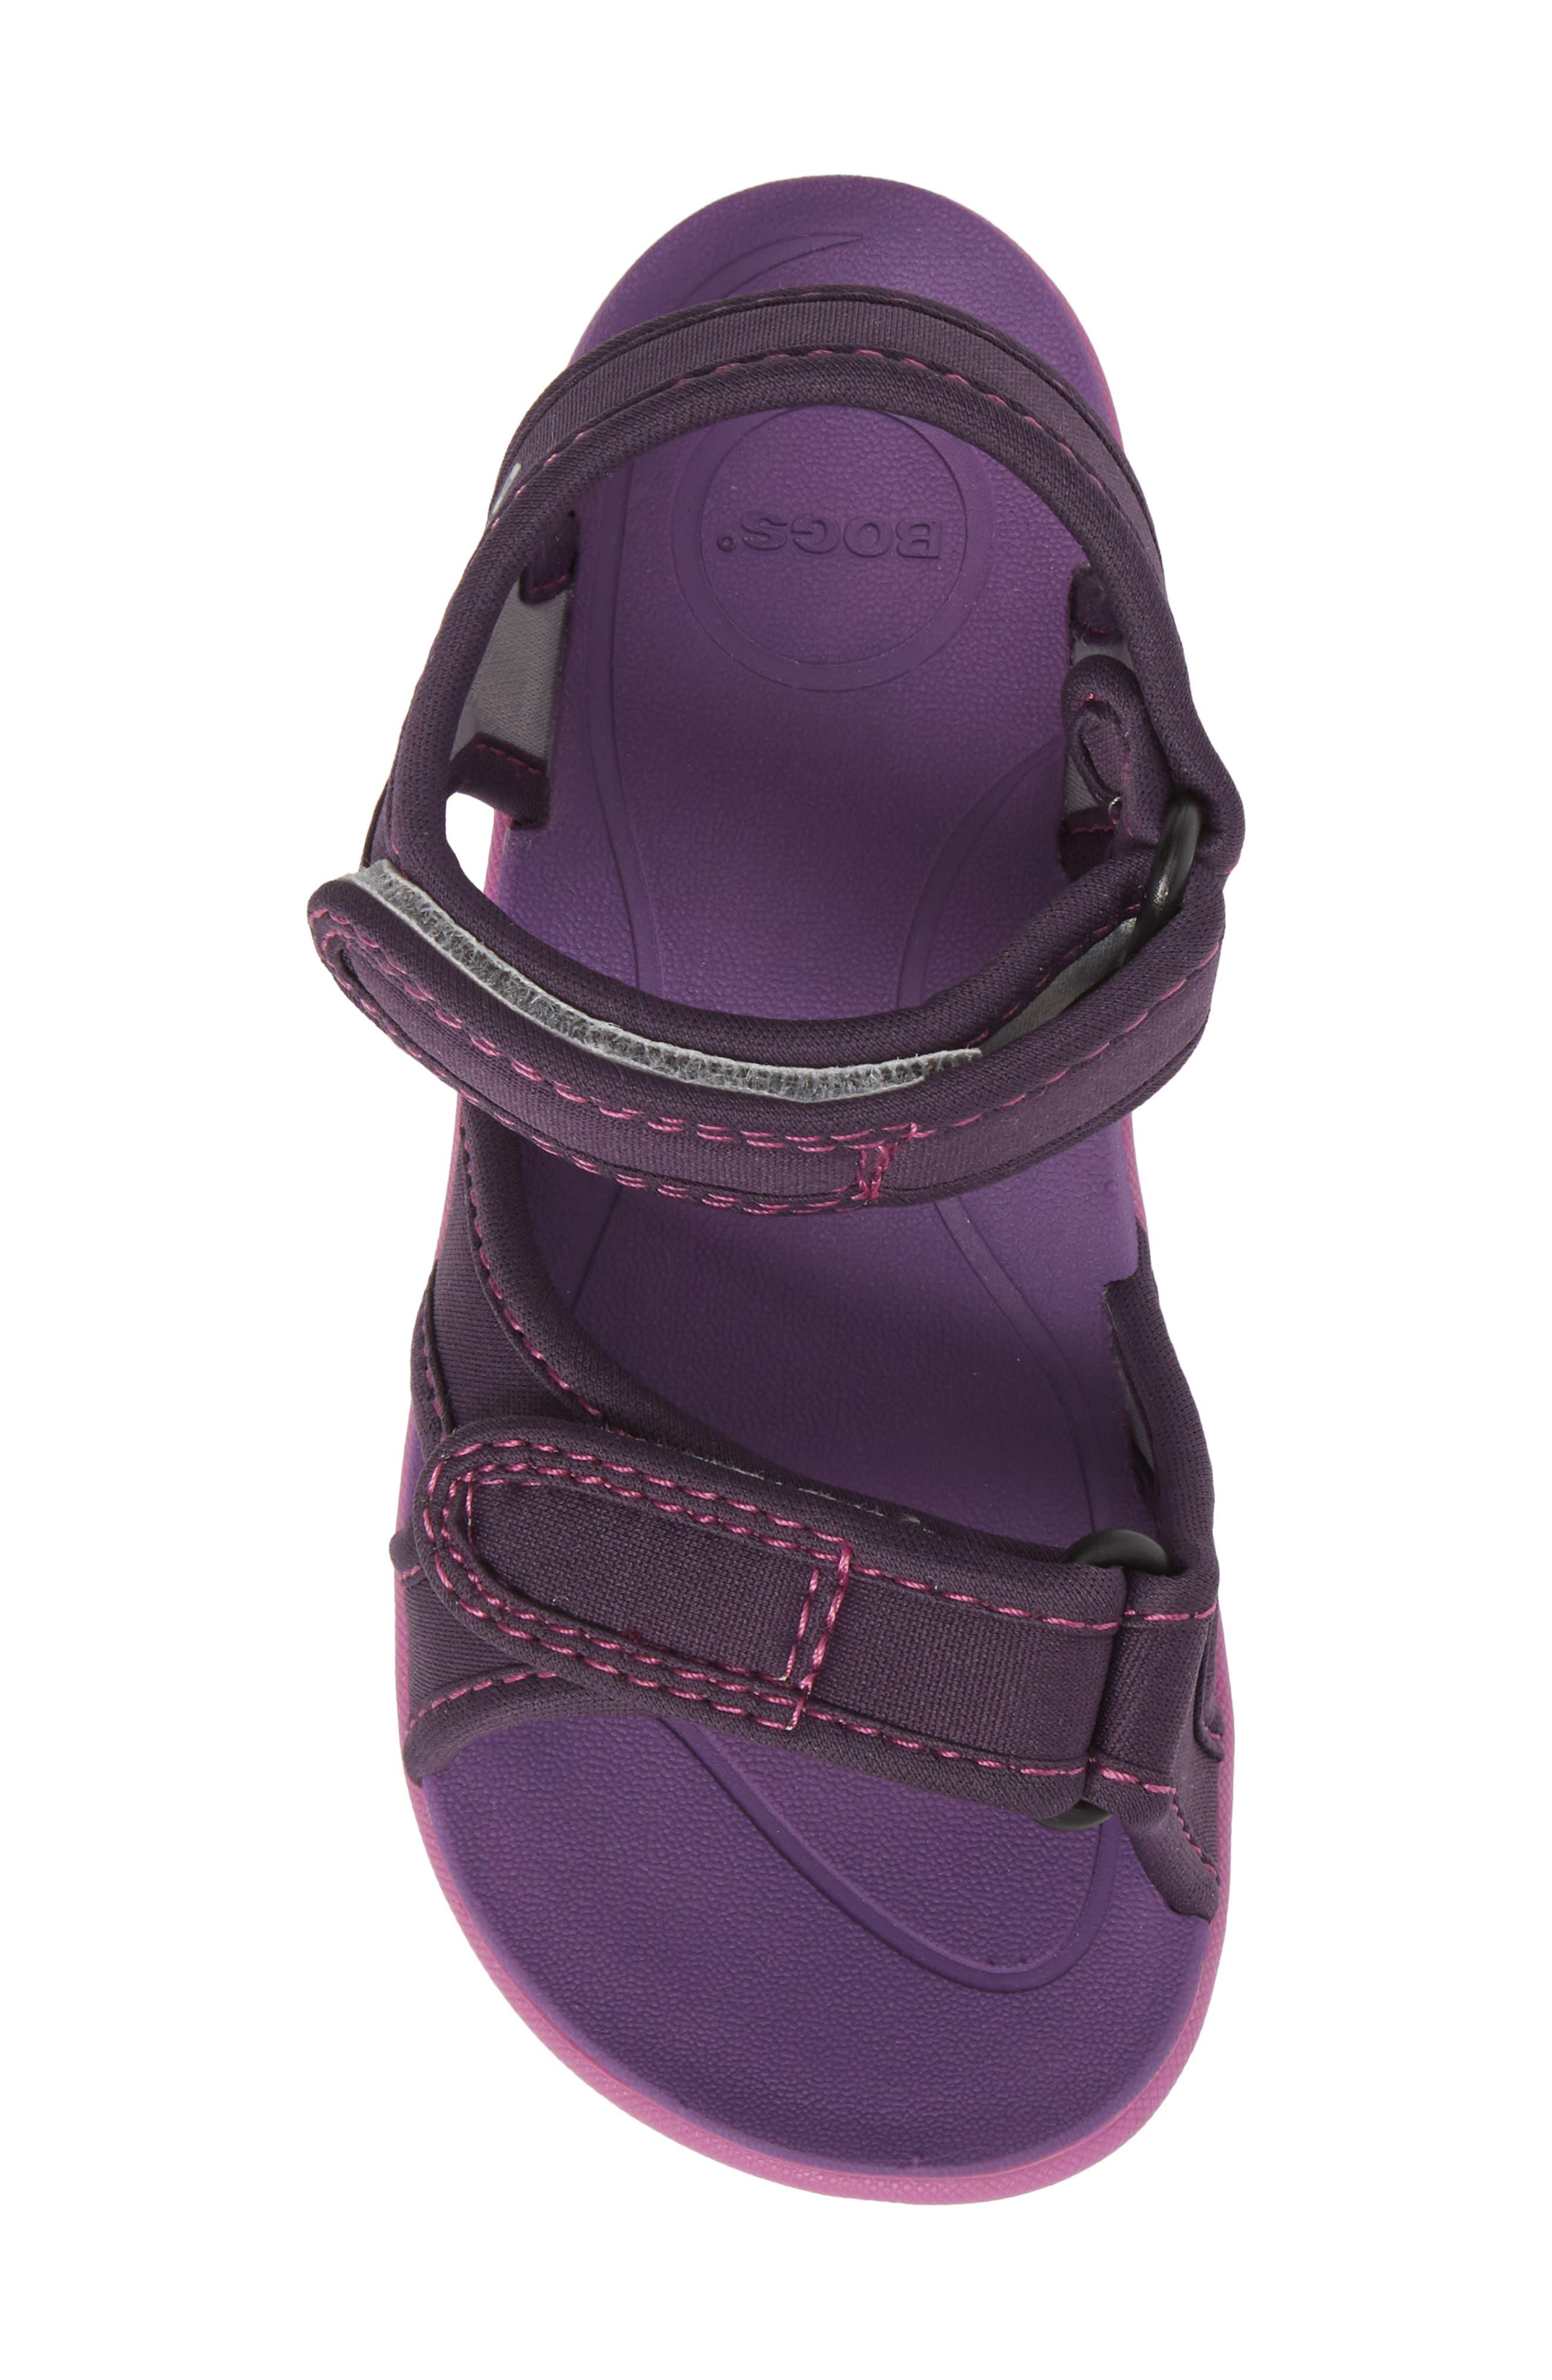 Whitefish Waterproof Sandal,                             Alternate thumbnail 5, color,                             Eggplant Multi